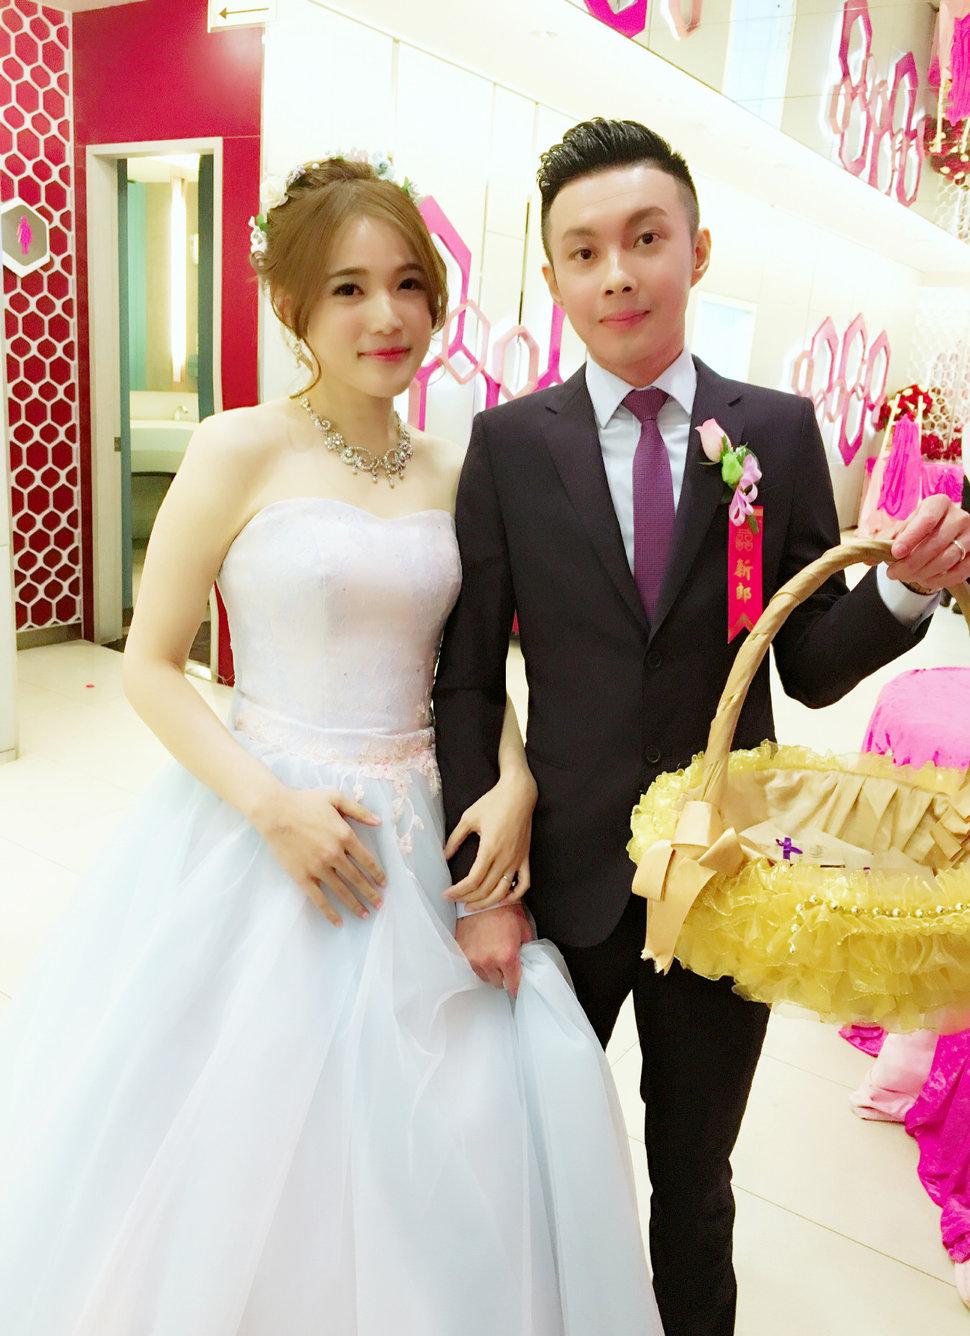 IMG_2993 - Candy彩妝造型 - 結婚吧